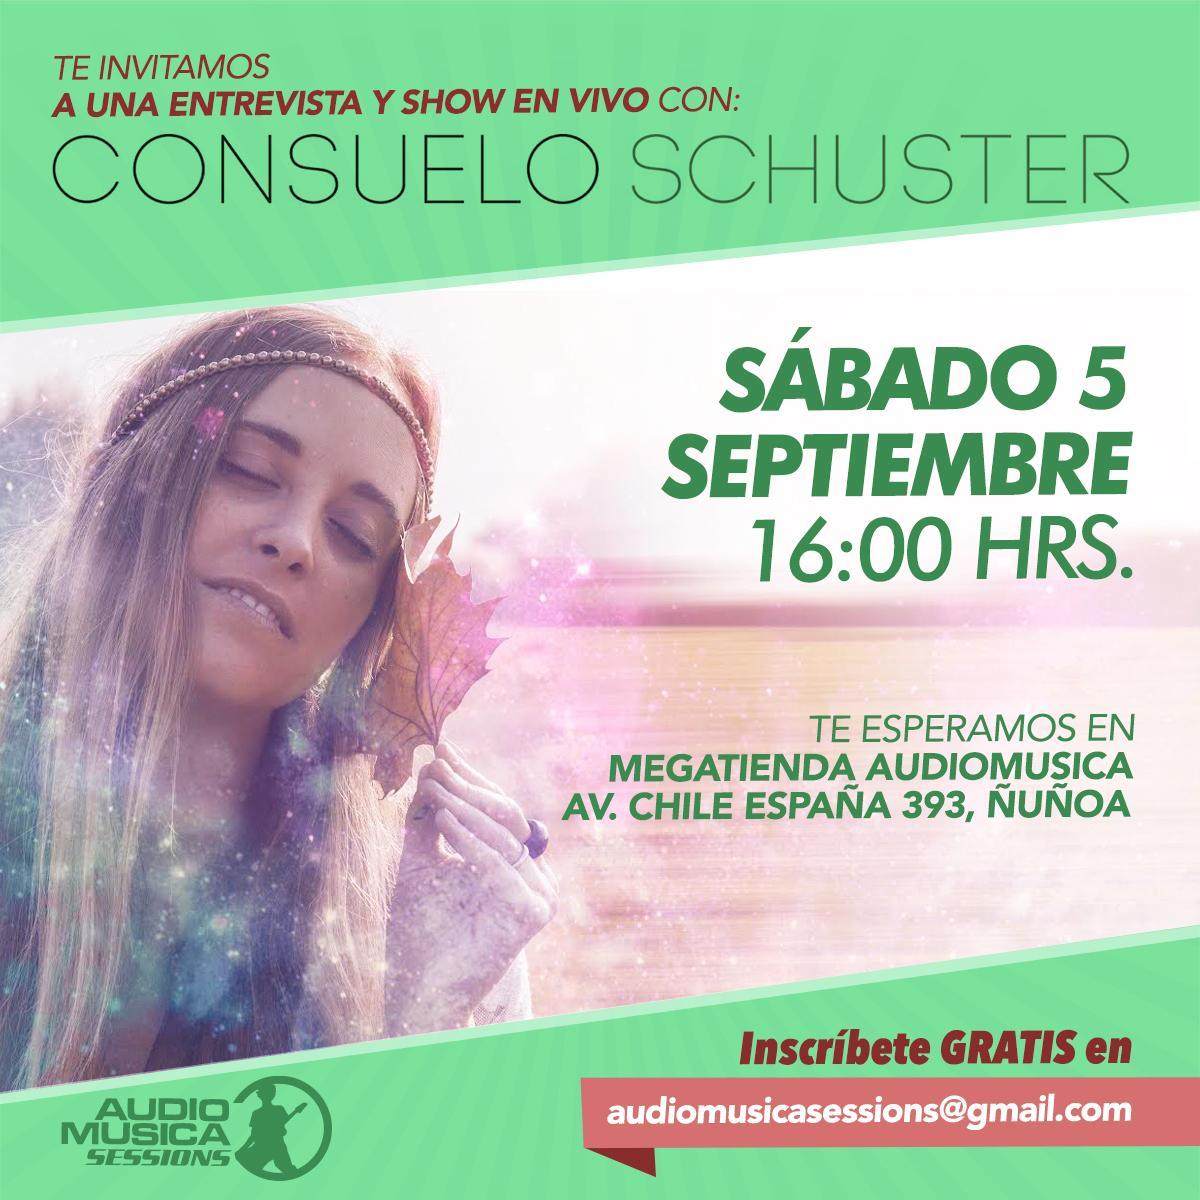 ¡Mañana  @ConsuSchuster en Audiomusica Sessions, inscríbete GRATIS c/tus datos en audiomusicasessions@gmail.com! http://t.co/tgkxCtaxx9